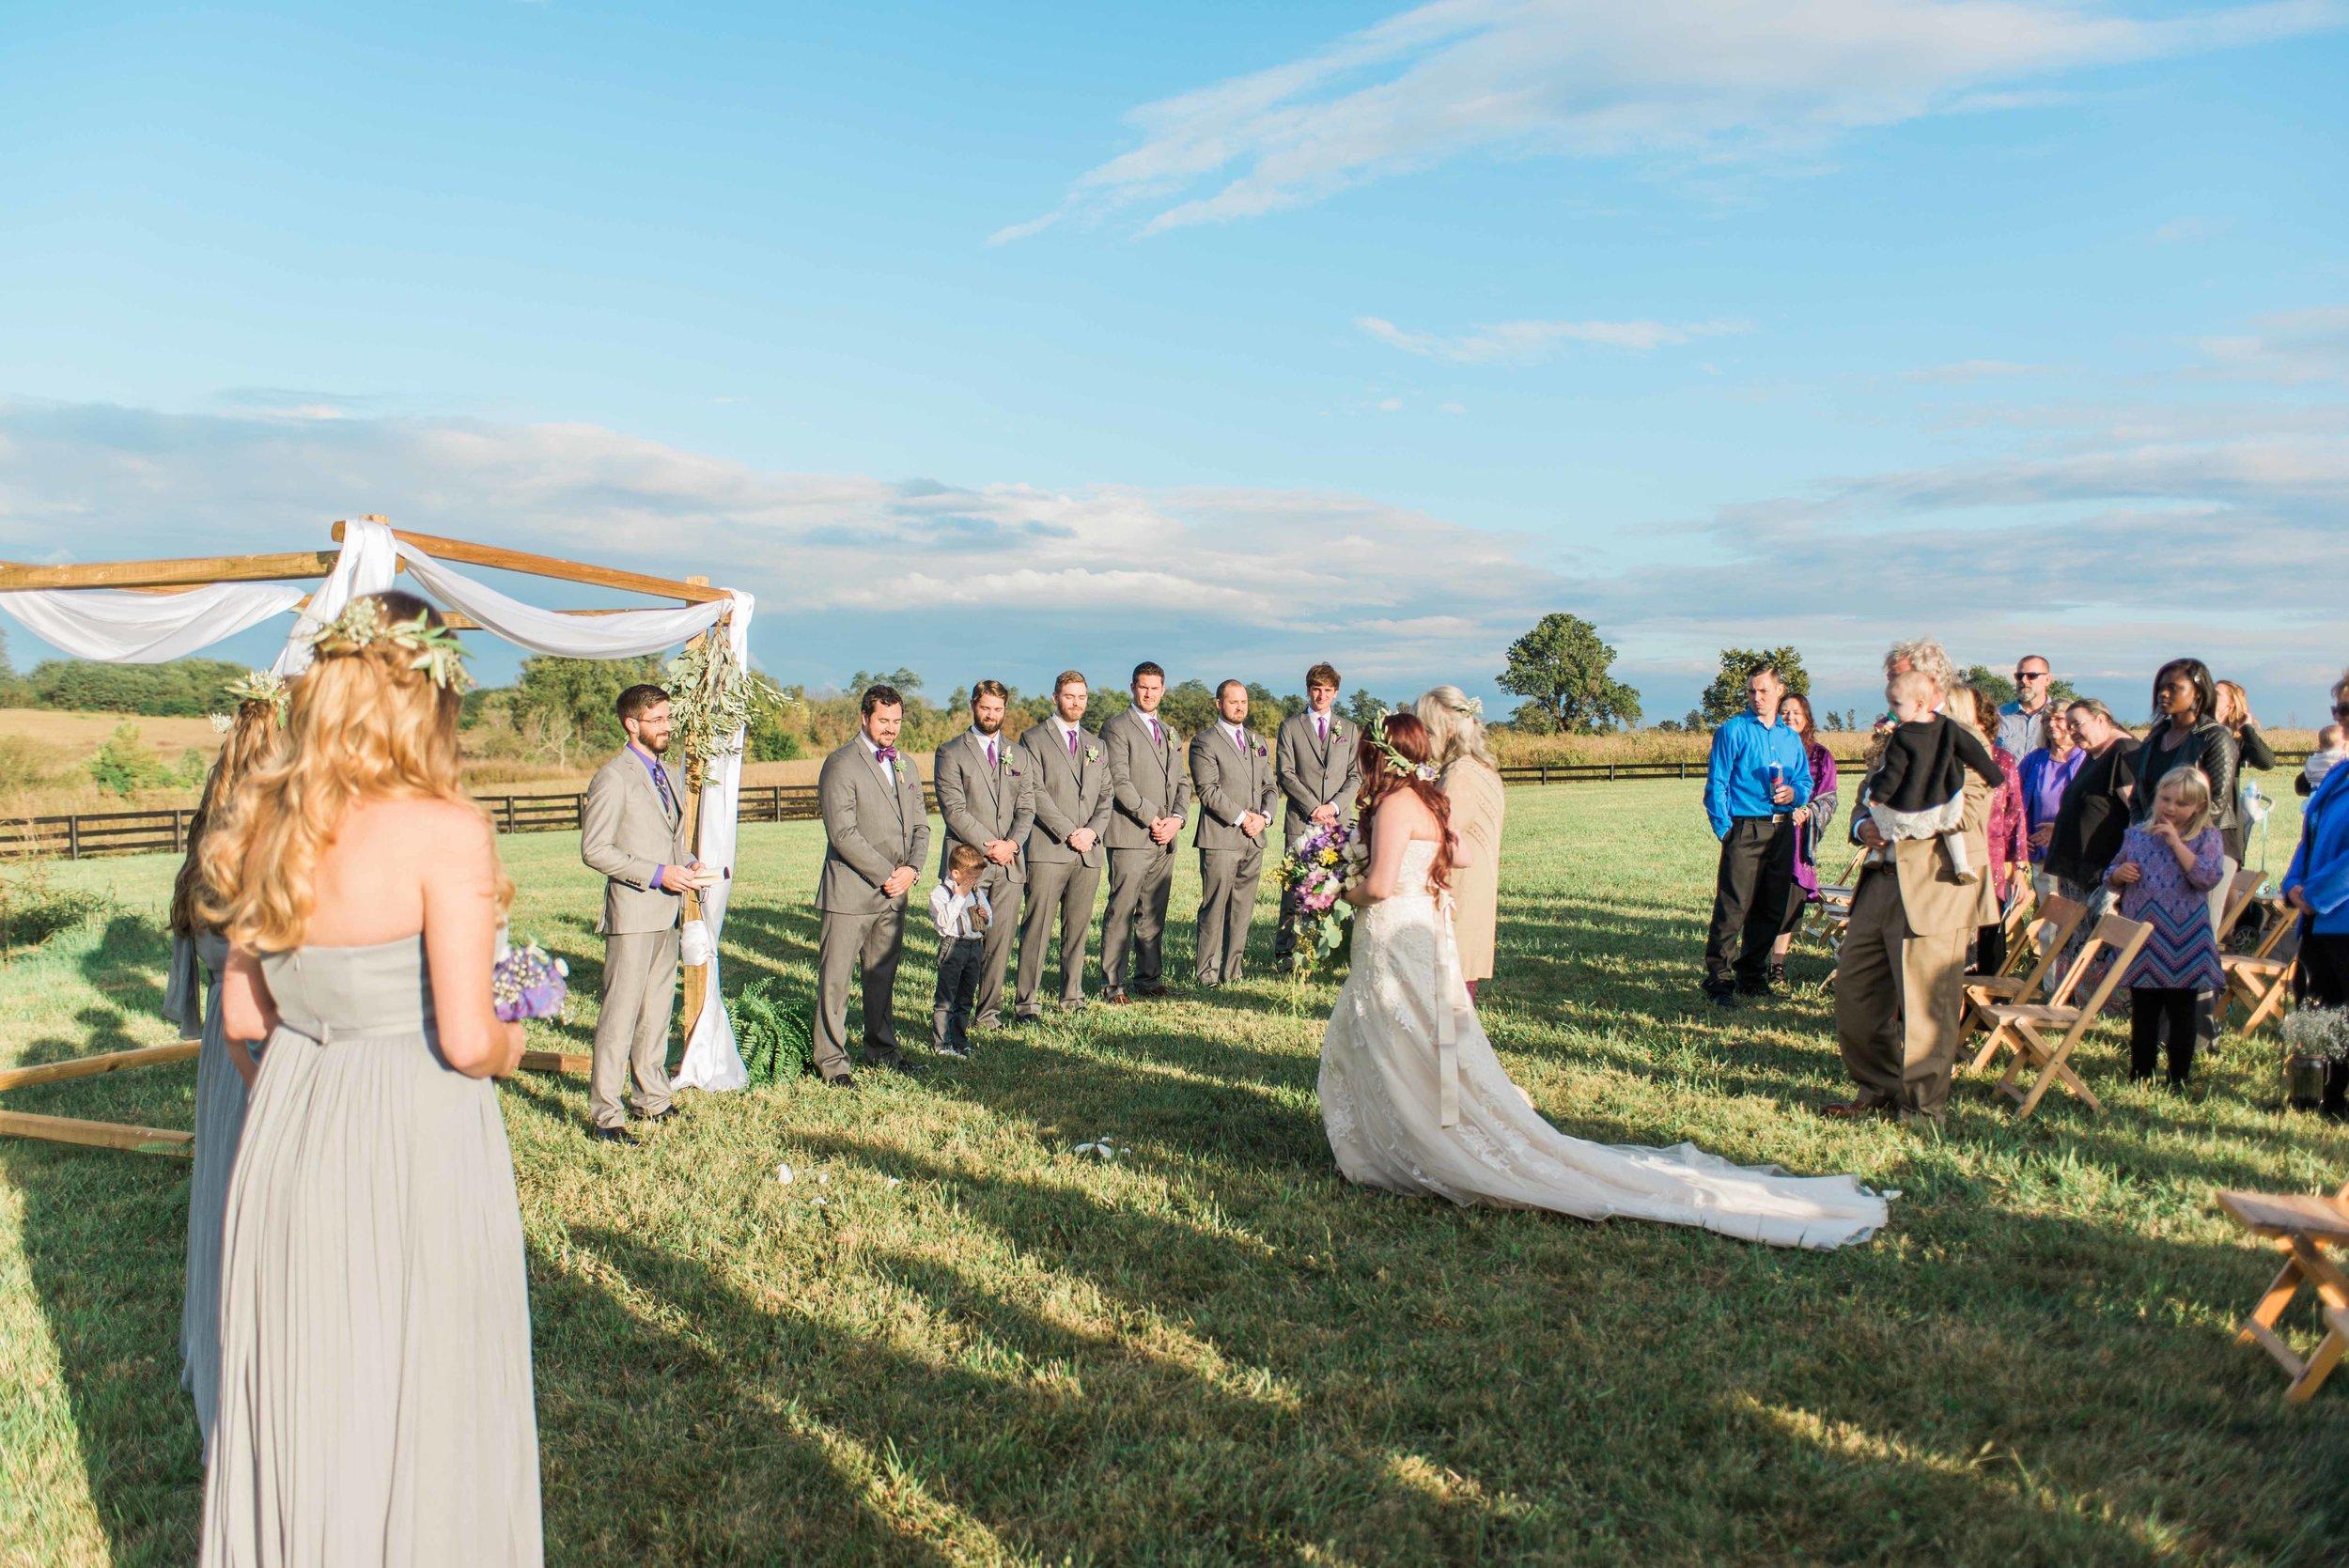 Kentucky outdoor wedding